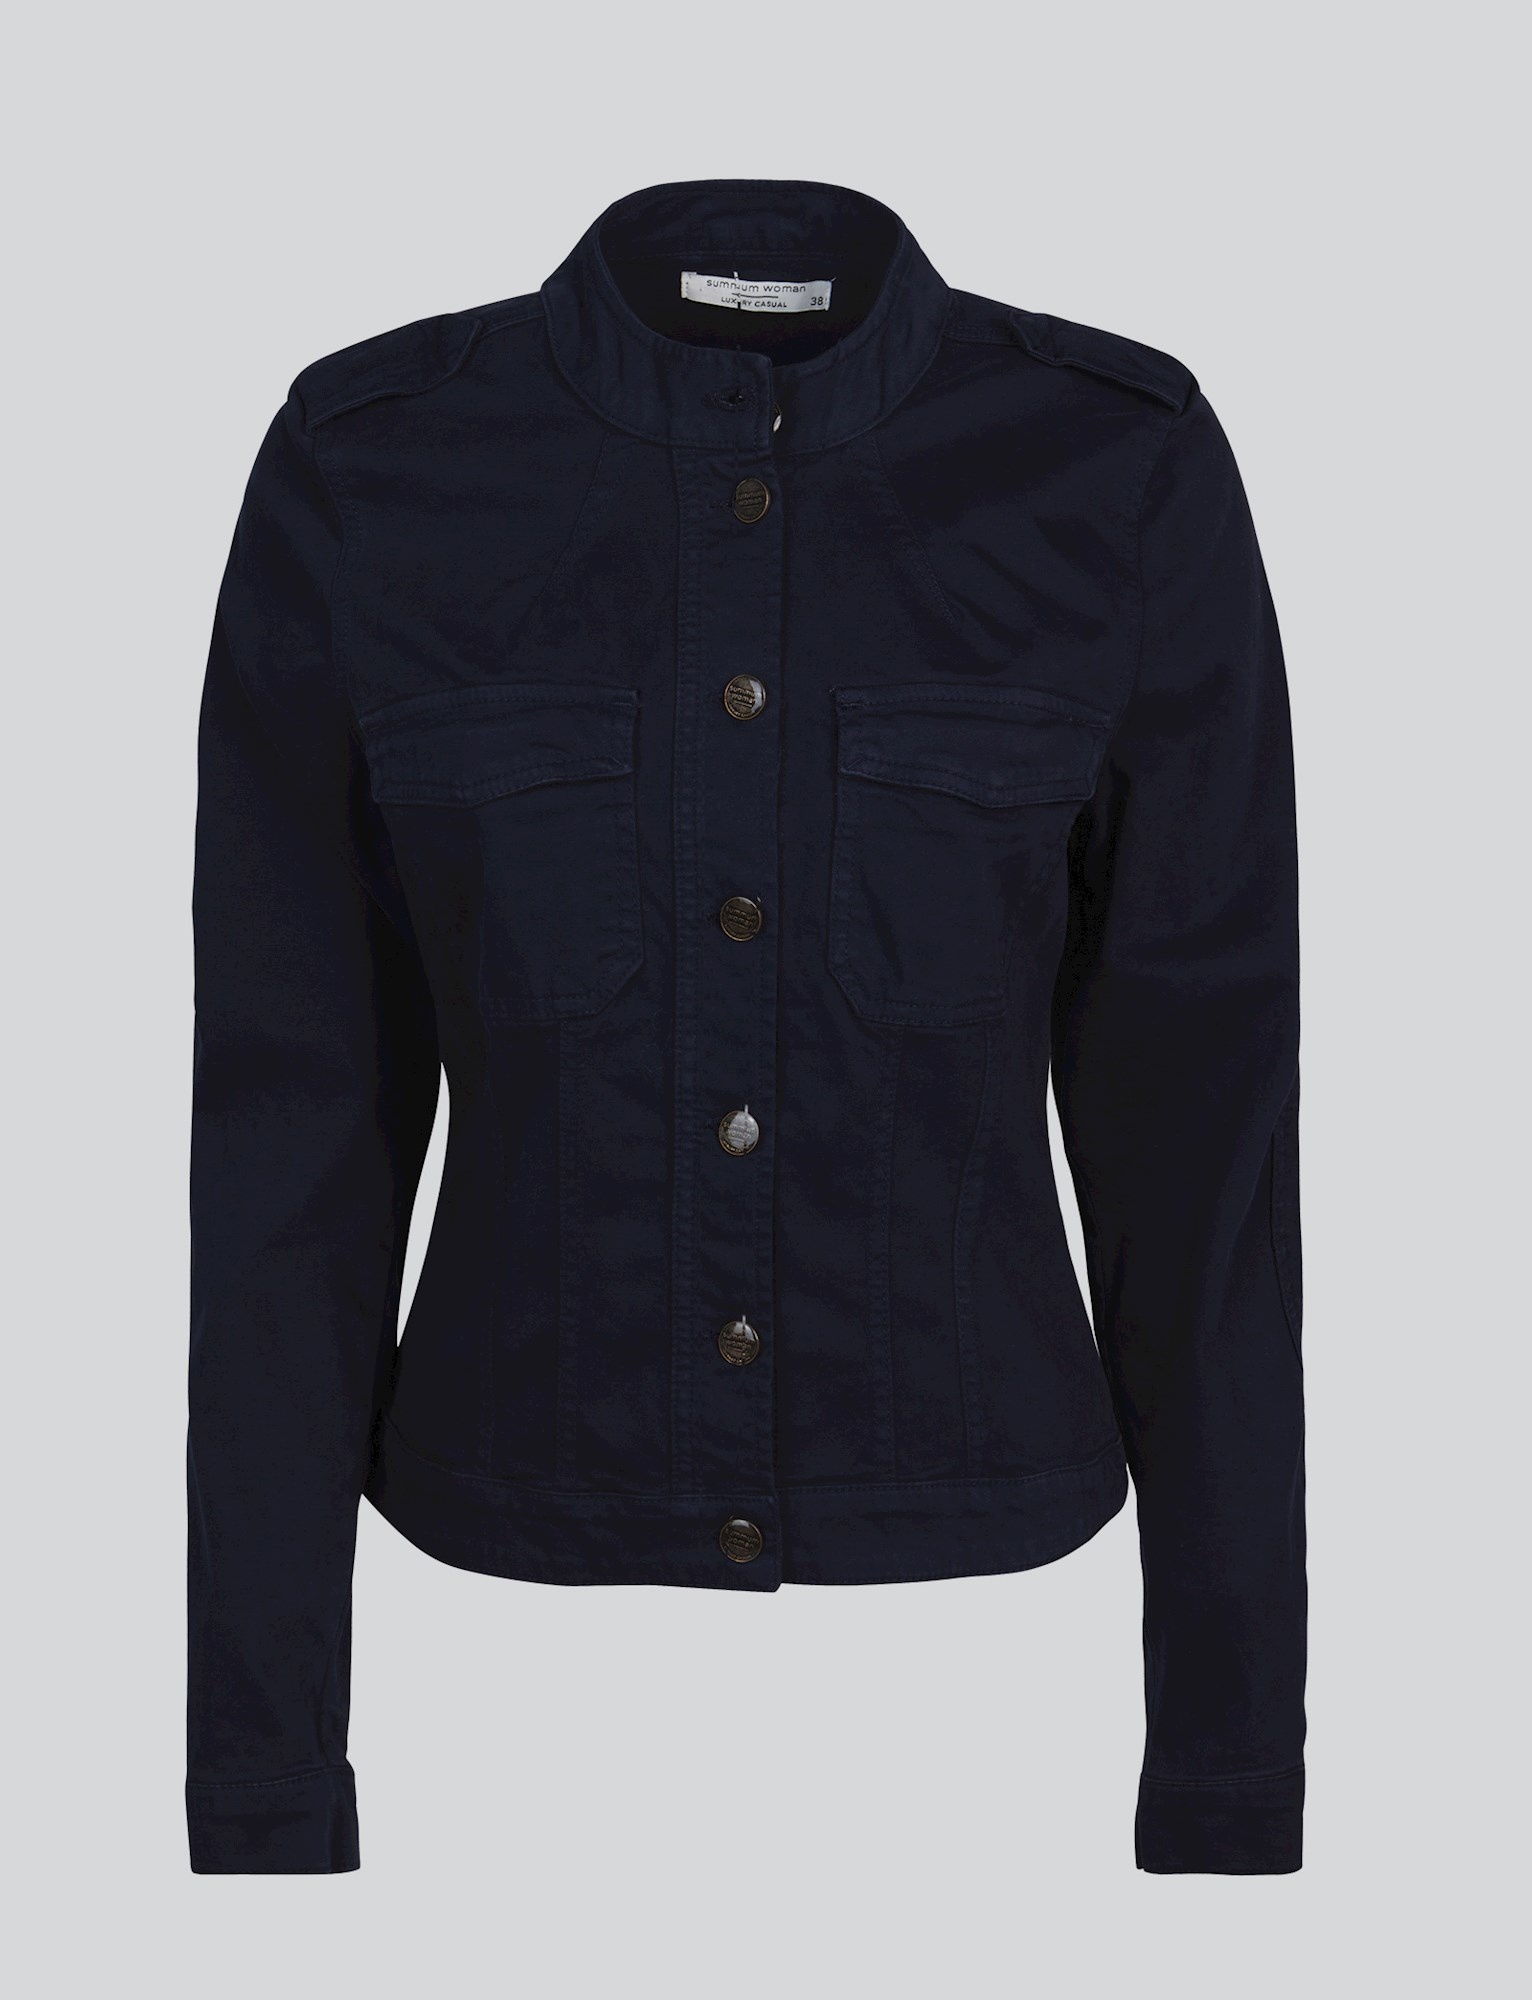 Summum jacket 1S-1034-11322-1